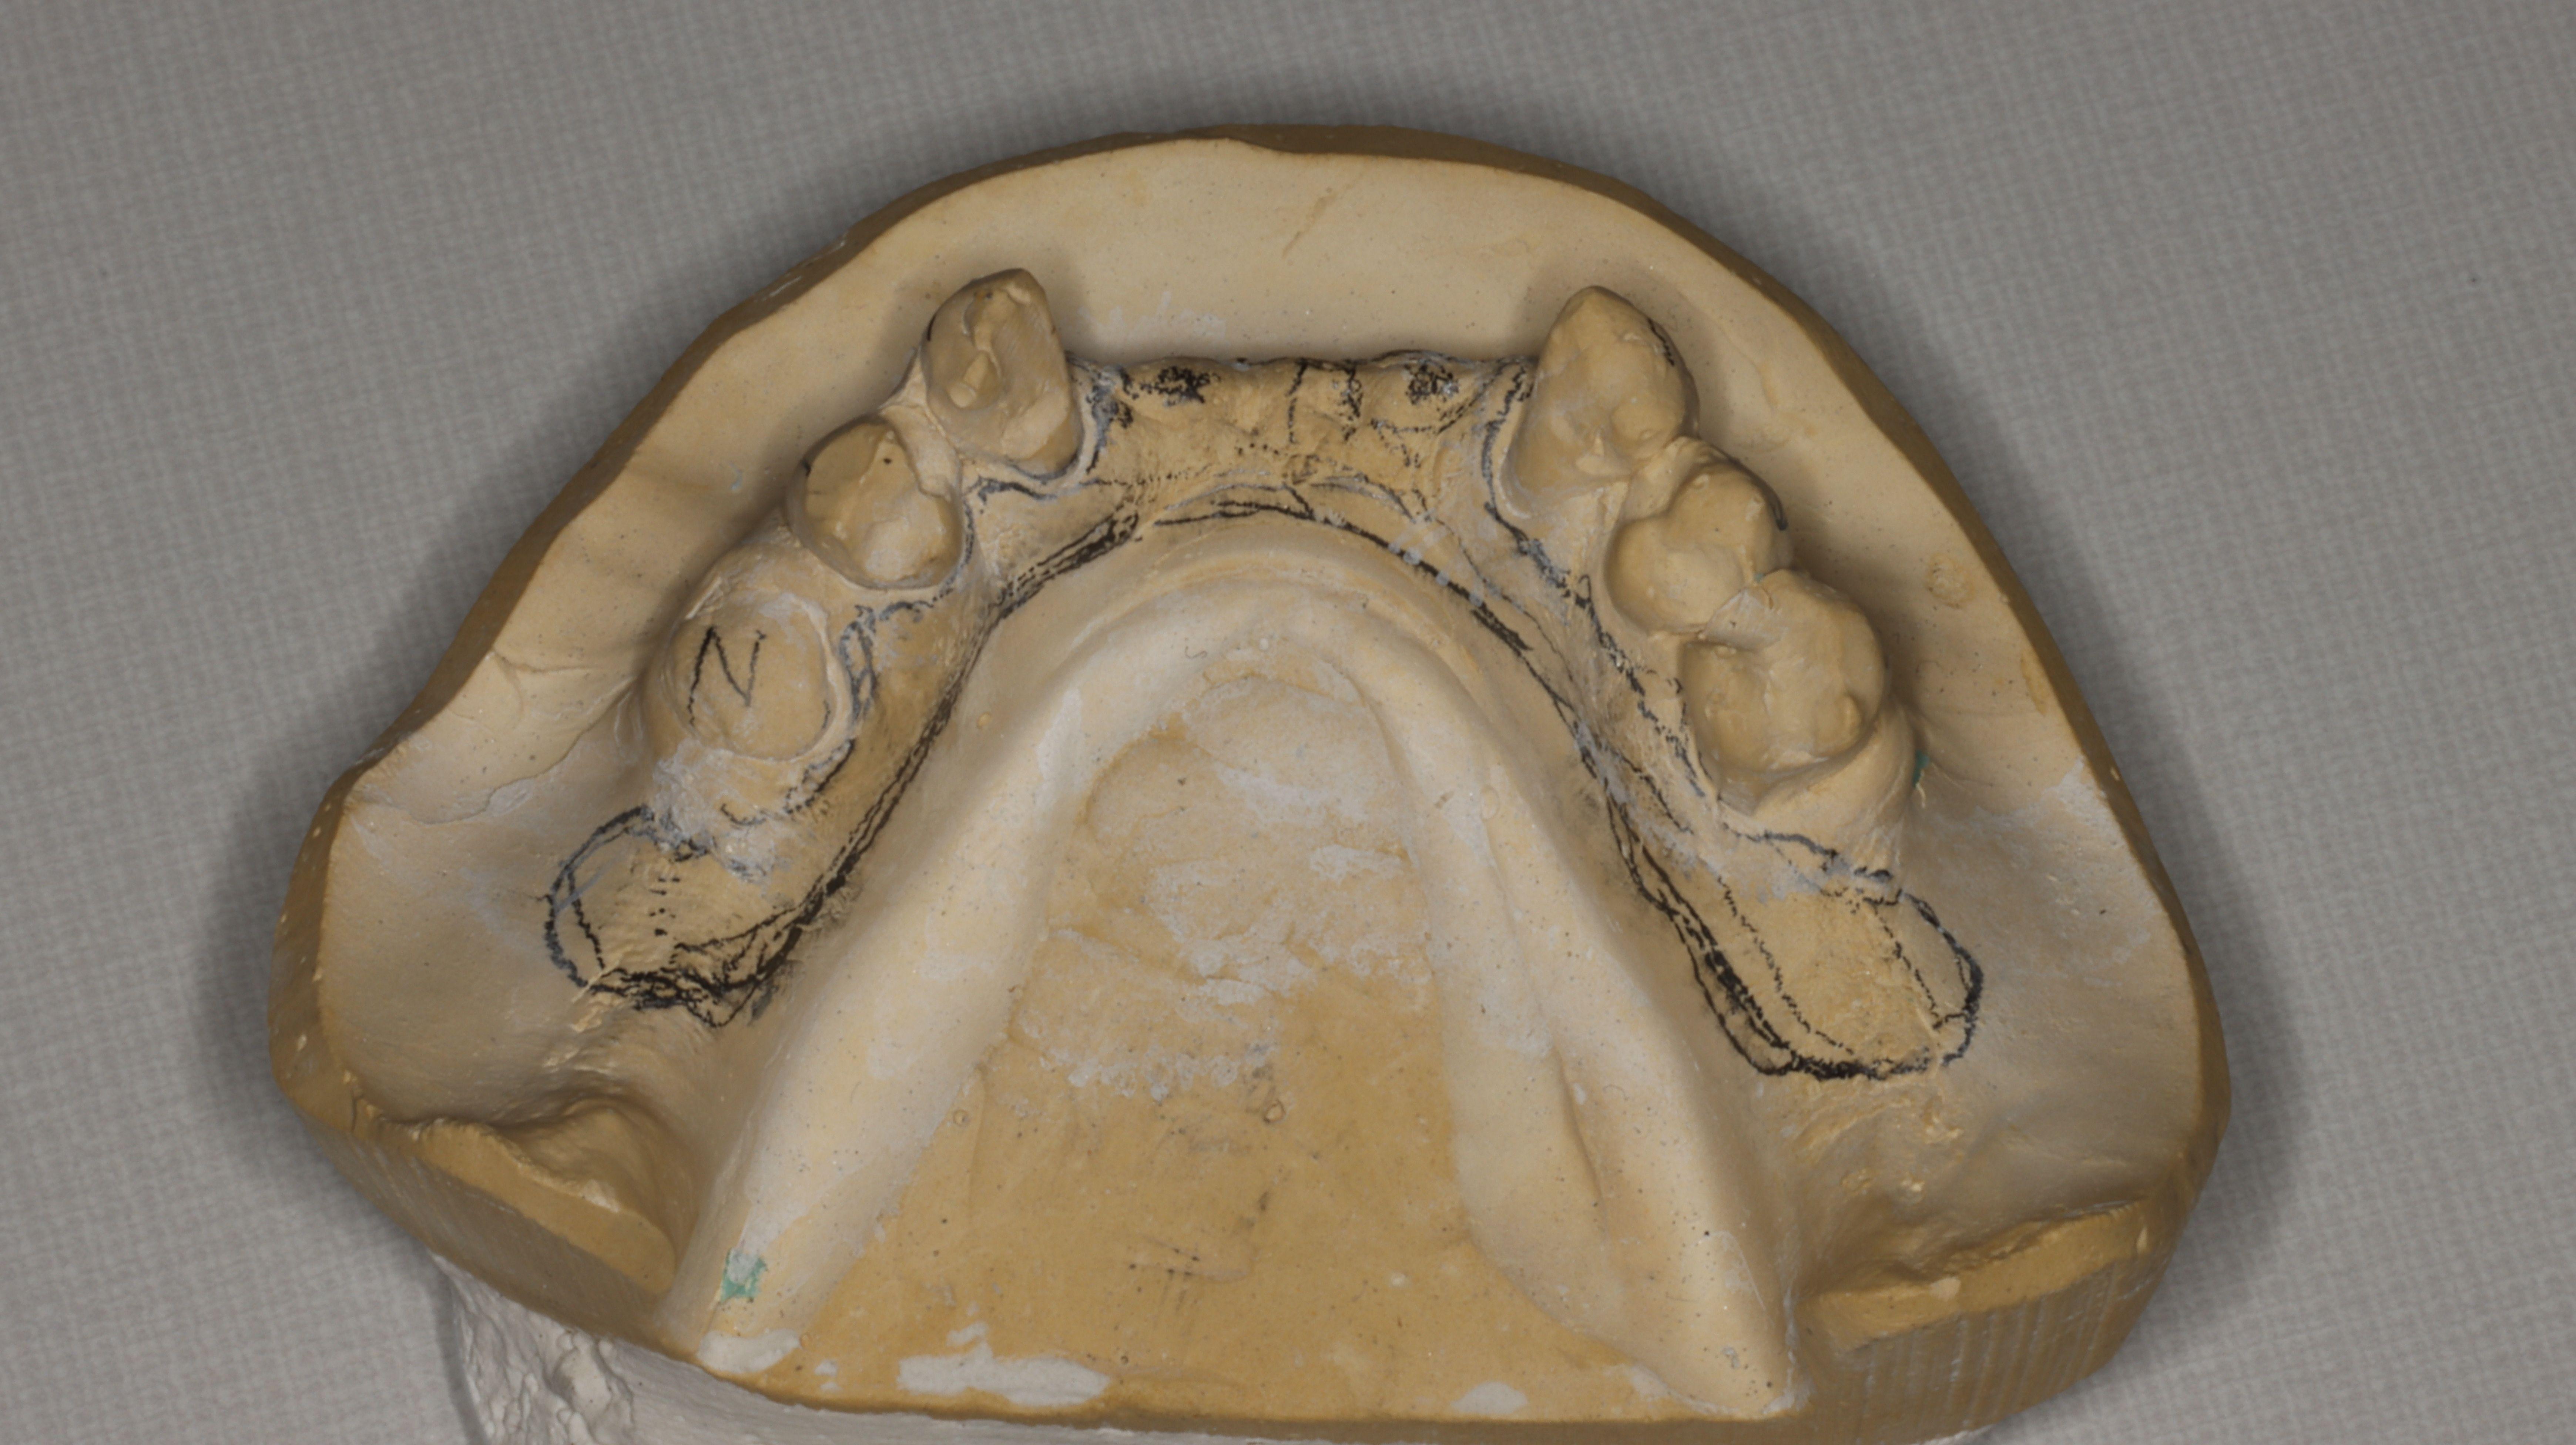 Figure 12. Stone cast and design for cast metal reinforcement incorporated into mandibular overdenture.